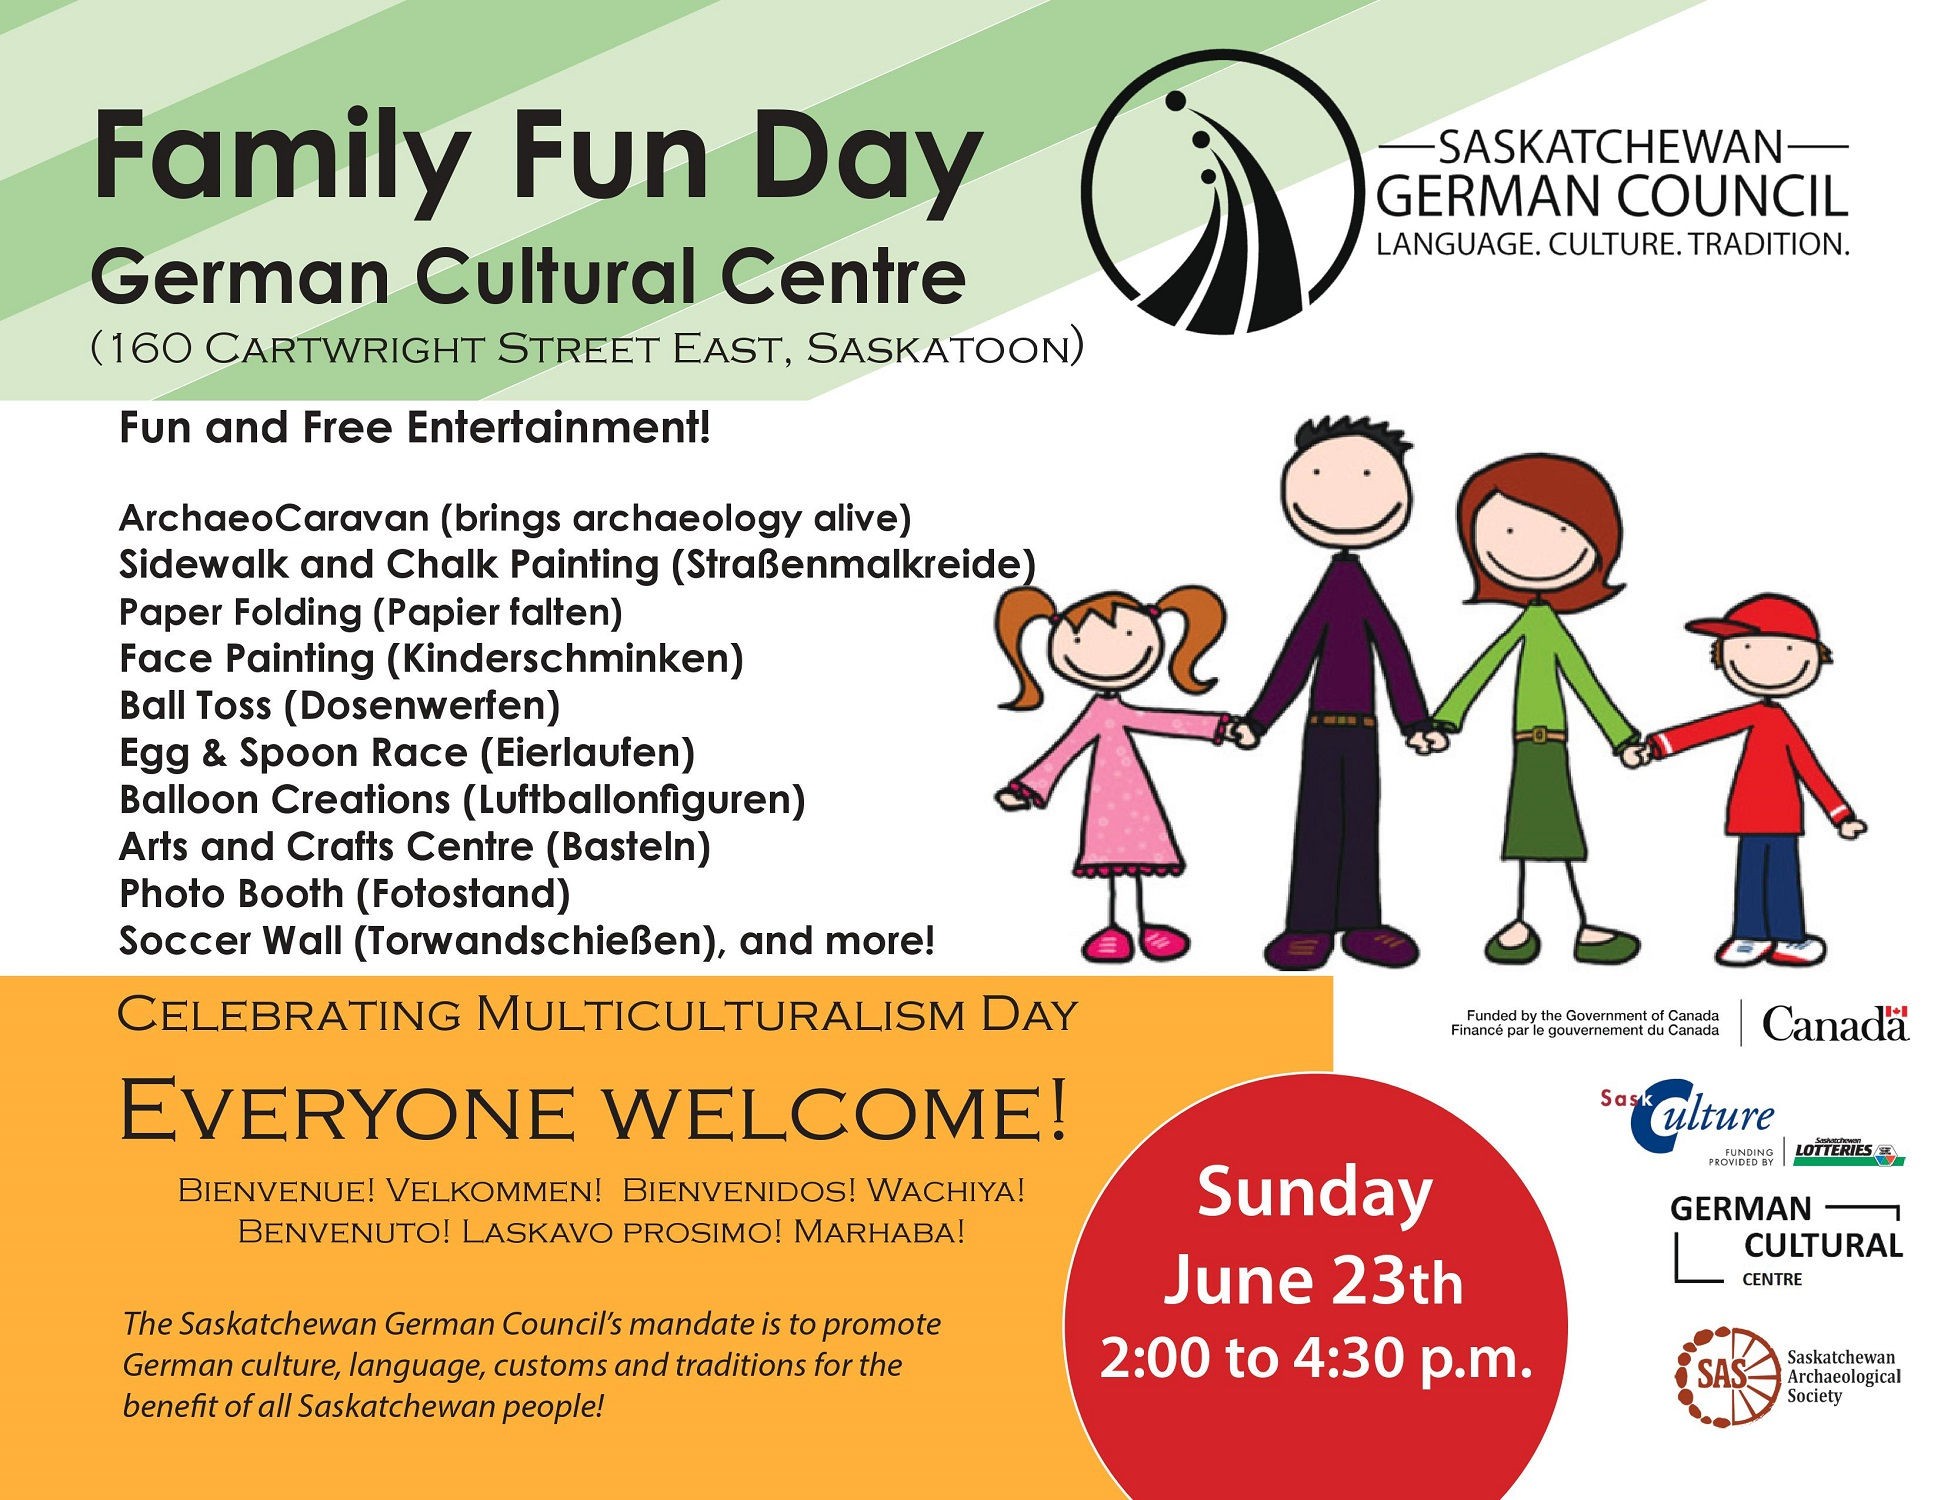 SGC Family Fun Day